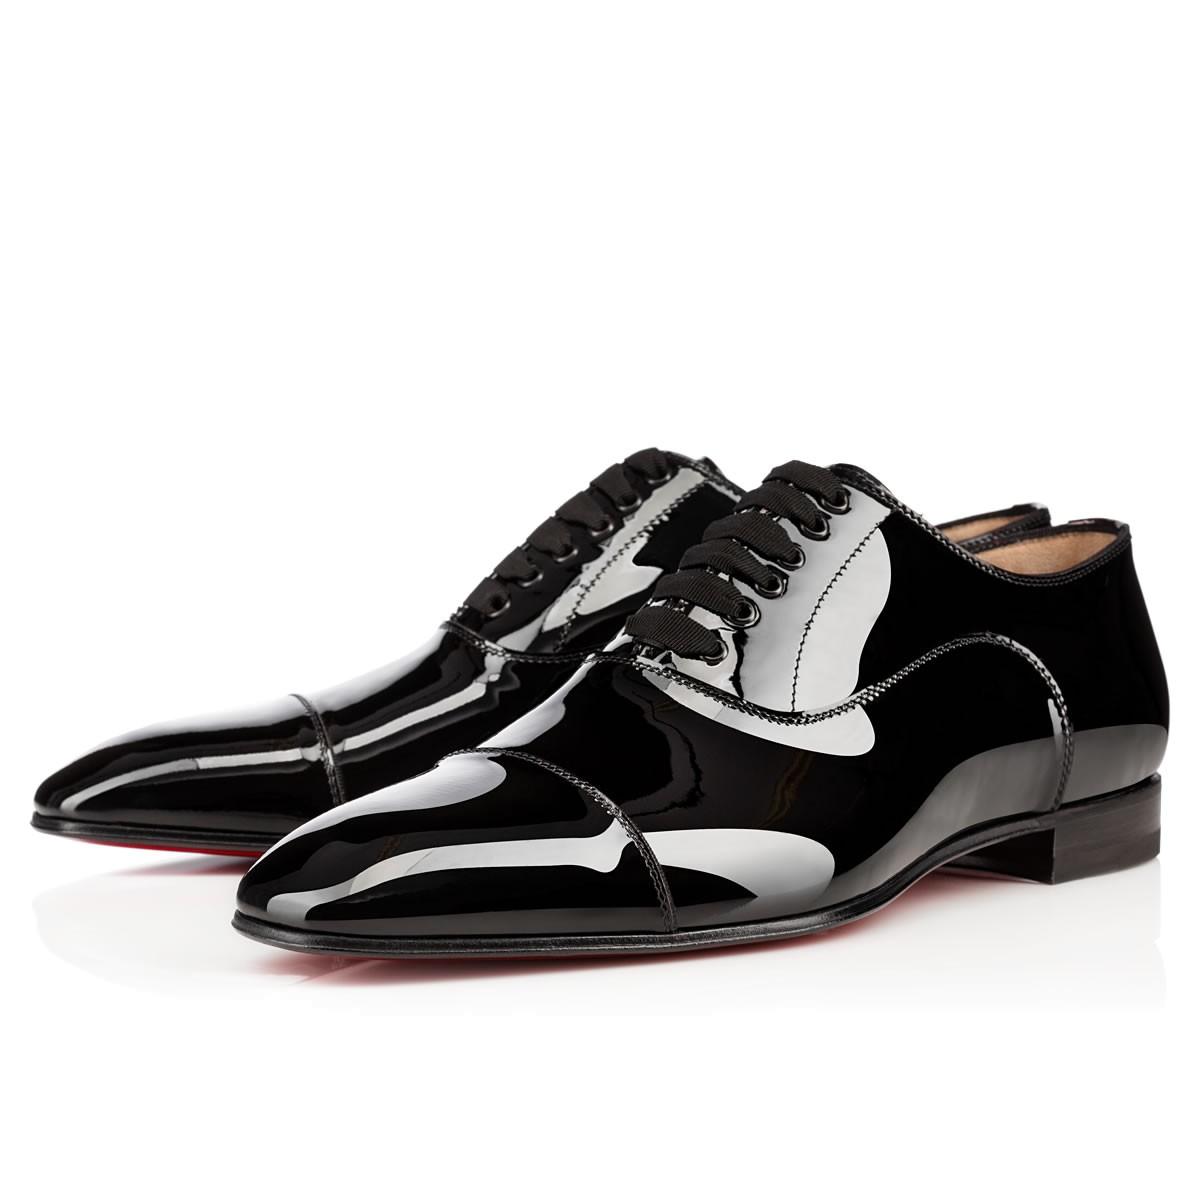 fake sneaker christian louboutin - christian louboutin metallic maria flats, christian louboutin shoe ...